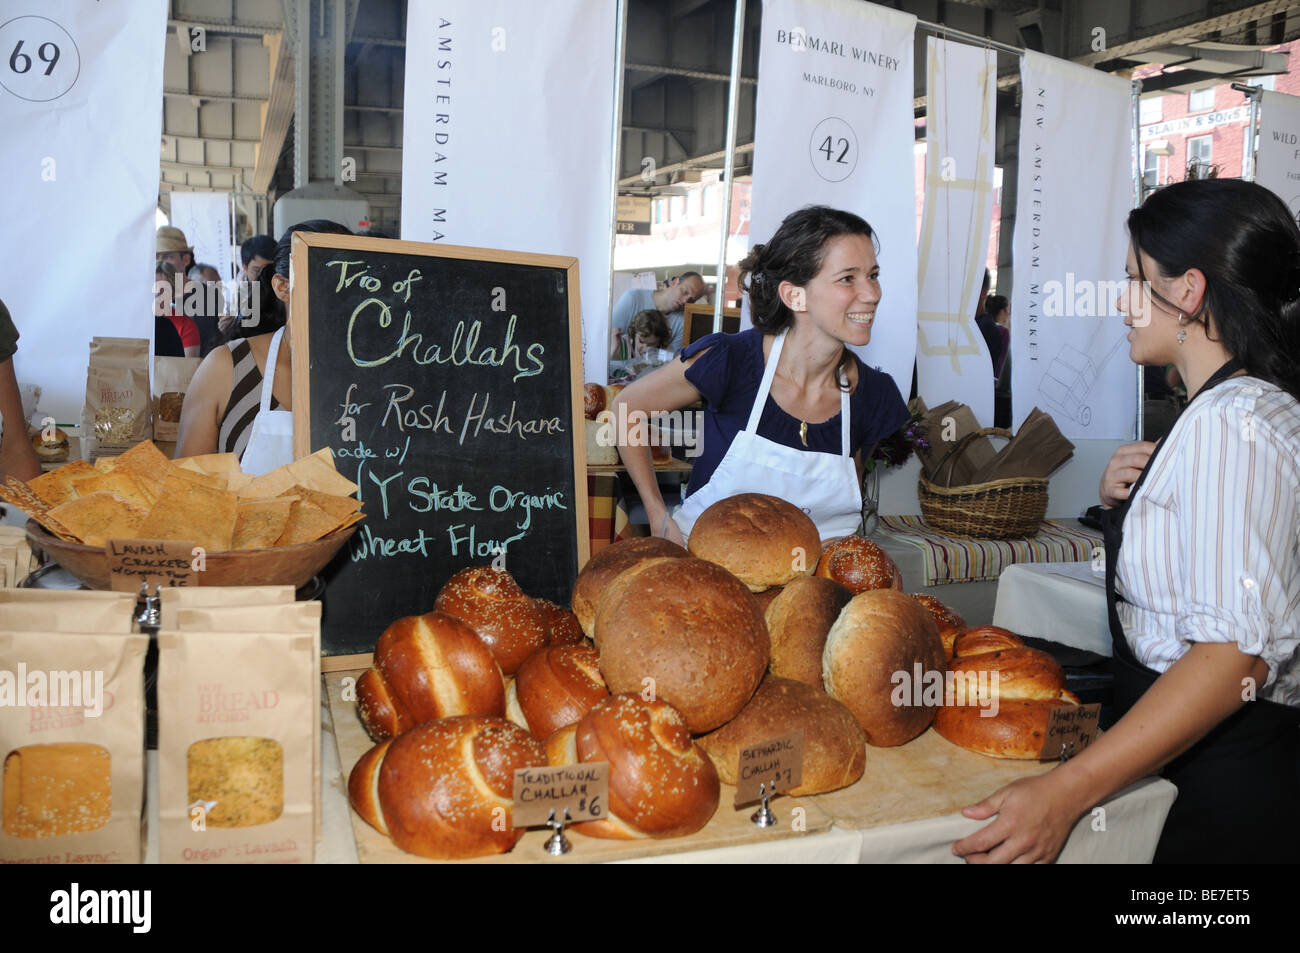 jessamyn waldman founder and director of hot bread kitchen at the new amsterdam market - Hot Bread Kitchen